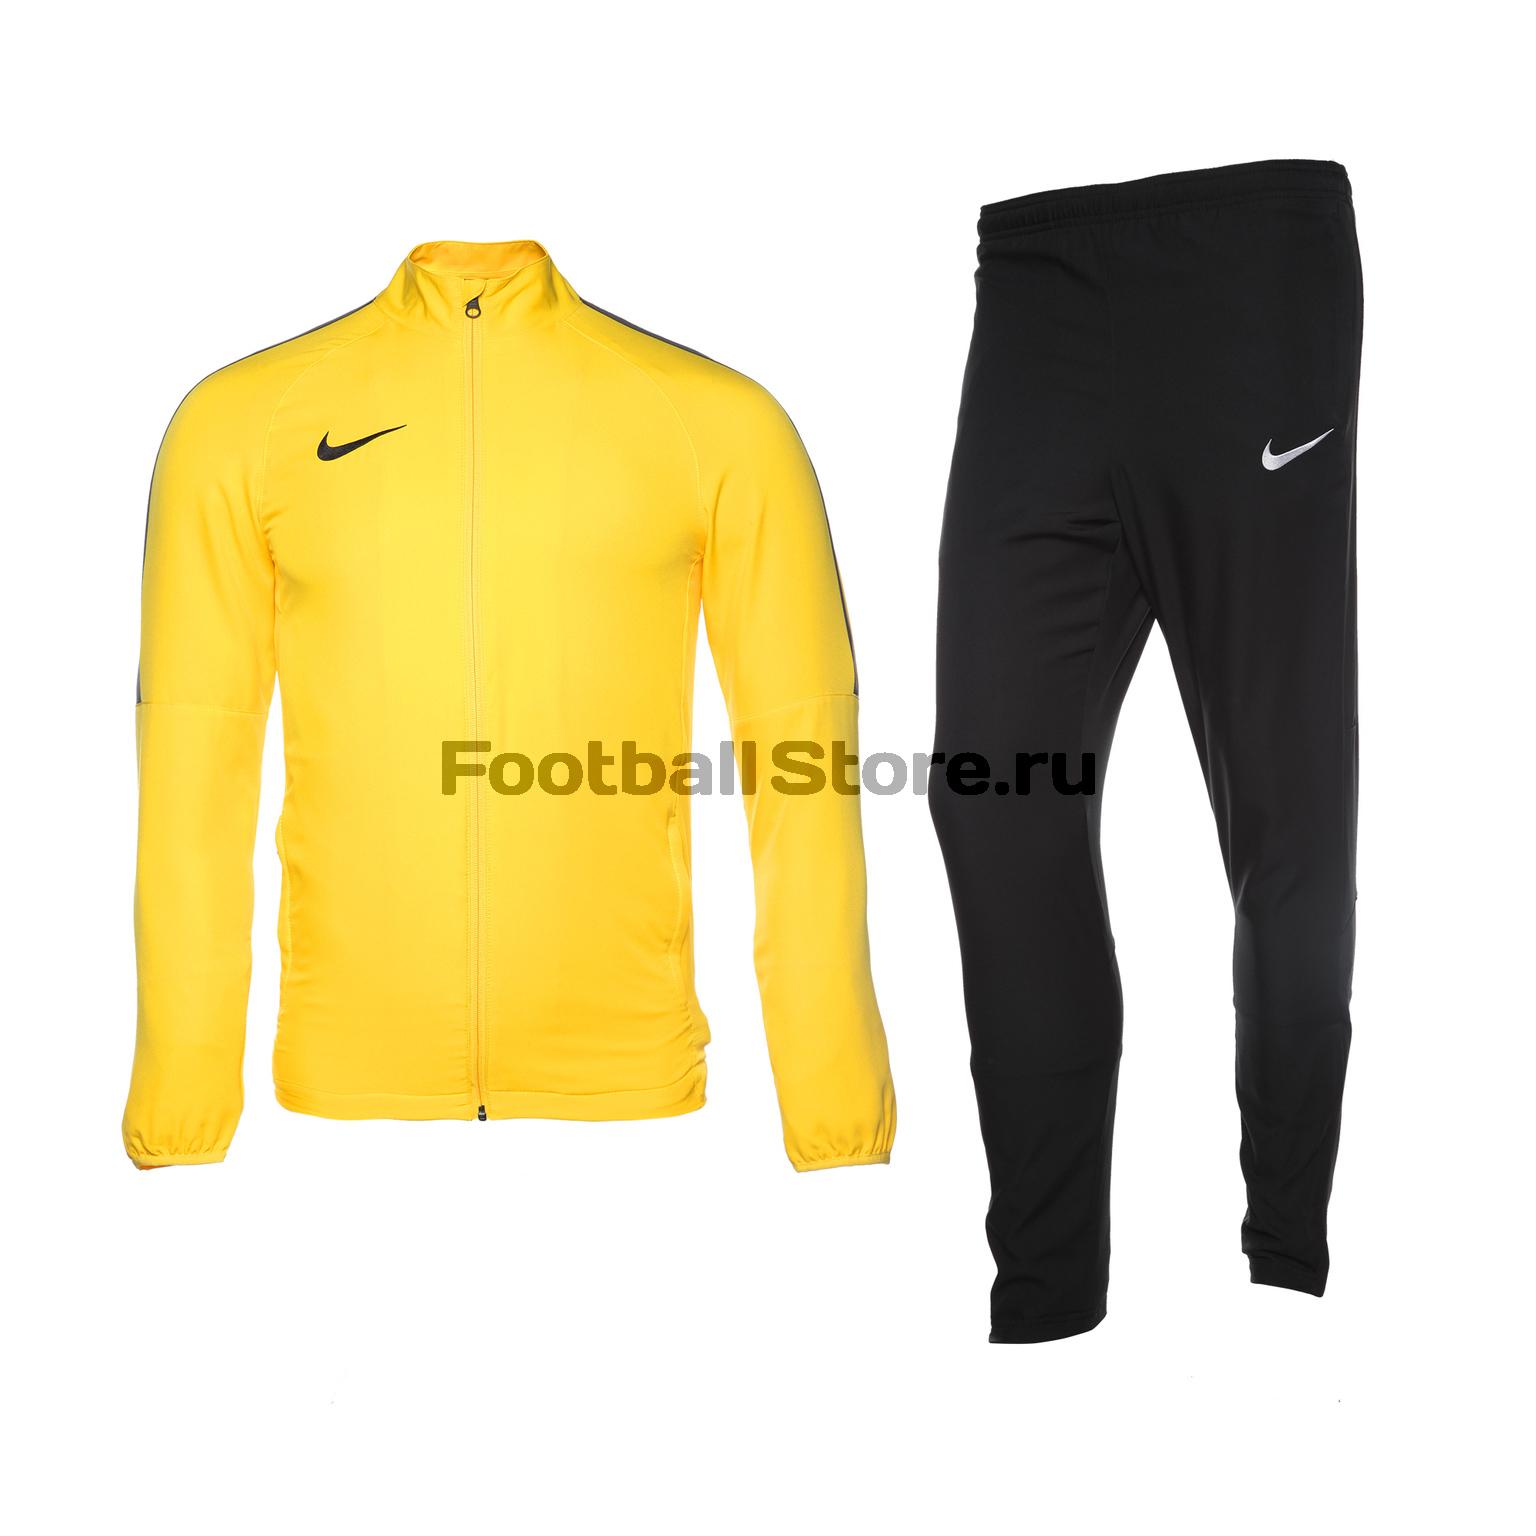 3754228f Костюм спортивный Nike Dry Academy18 TRK Suit W 893709-719 – купить в  интернет магазине footballstore, цена, фото